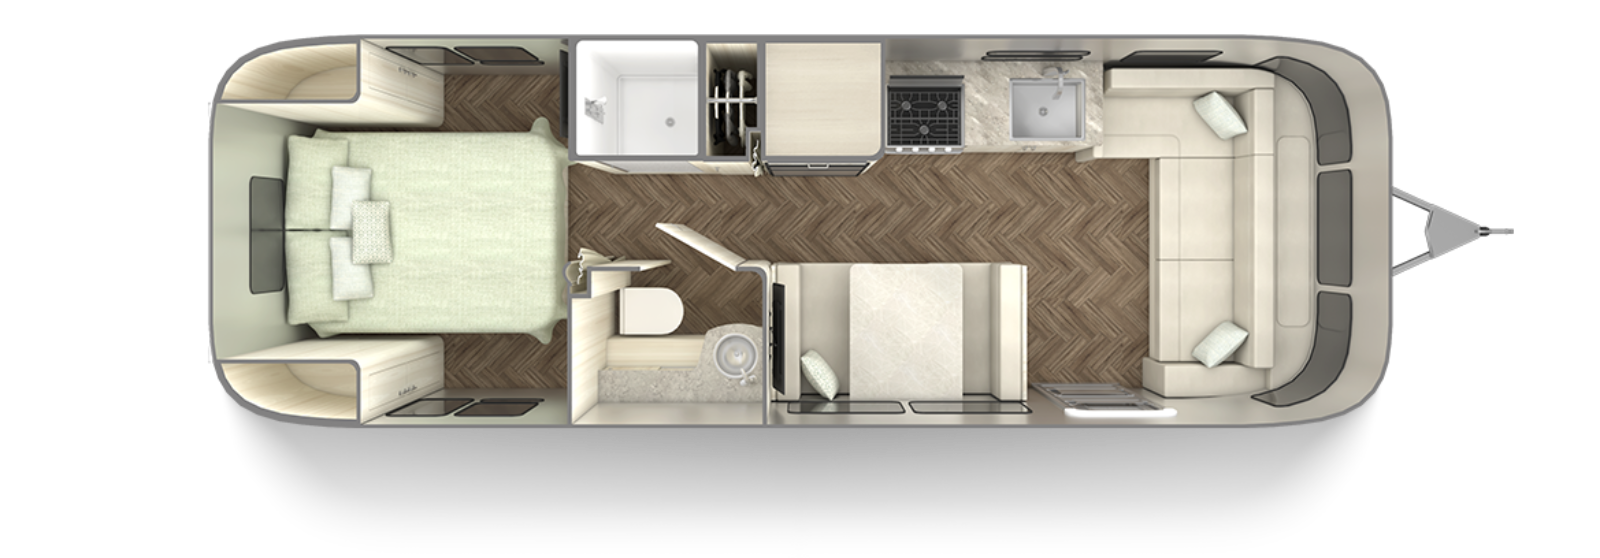 2021-Airstream-International-28RB-floor-plan-seashell